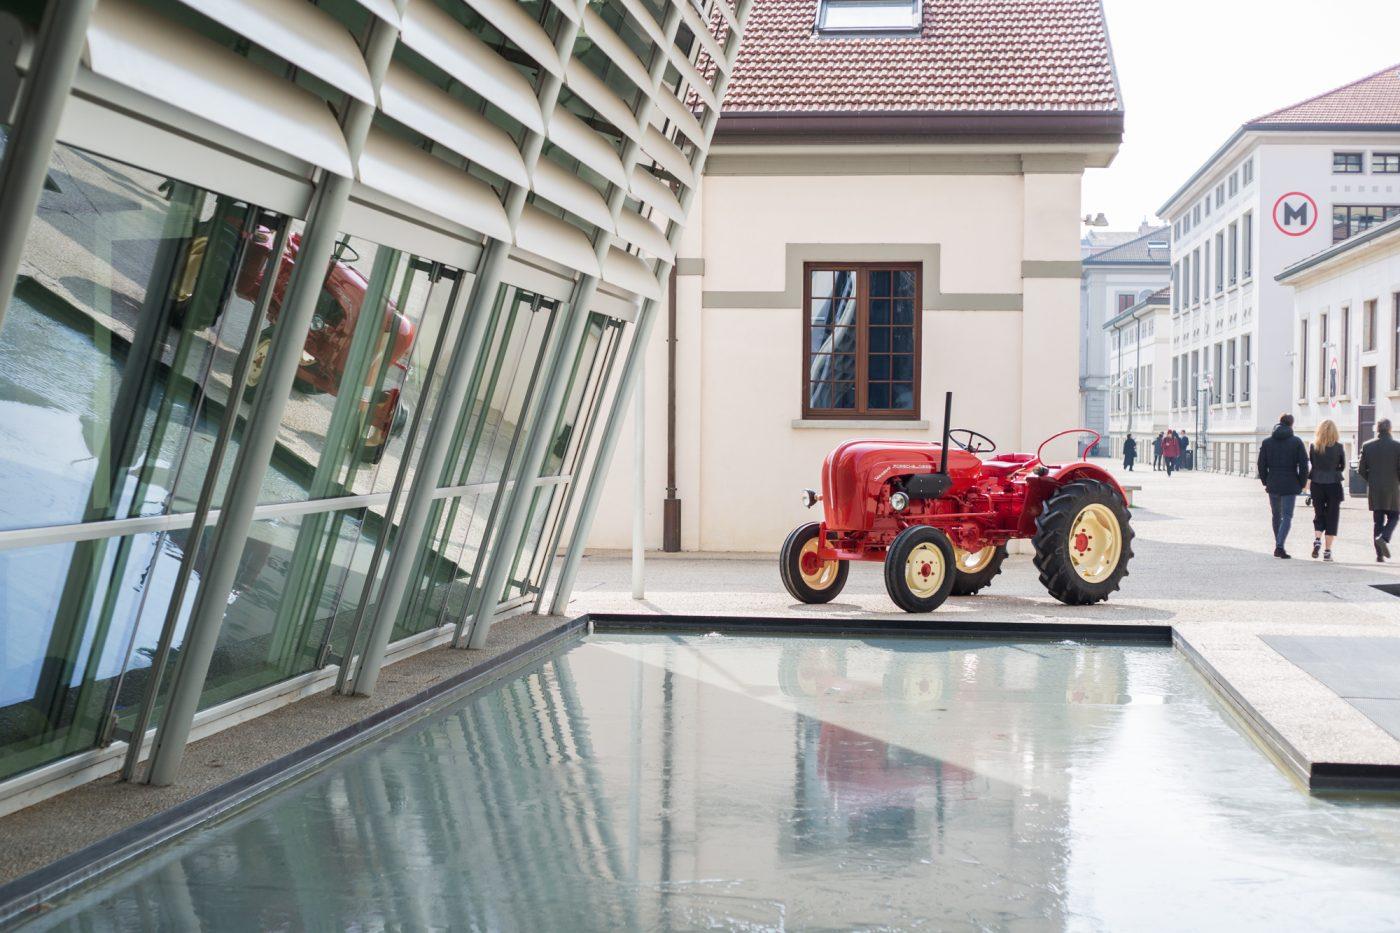 H-FARM Milano reskill